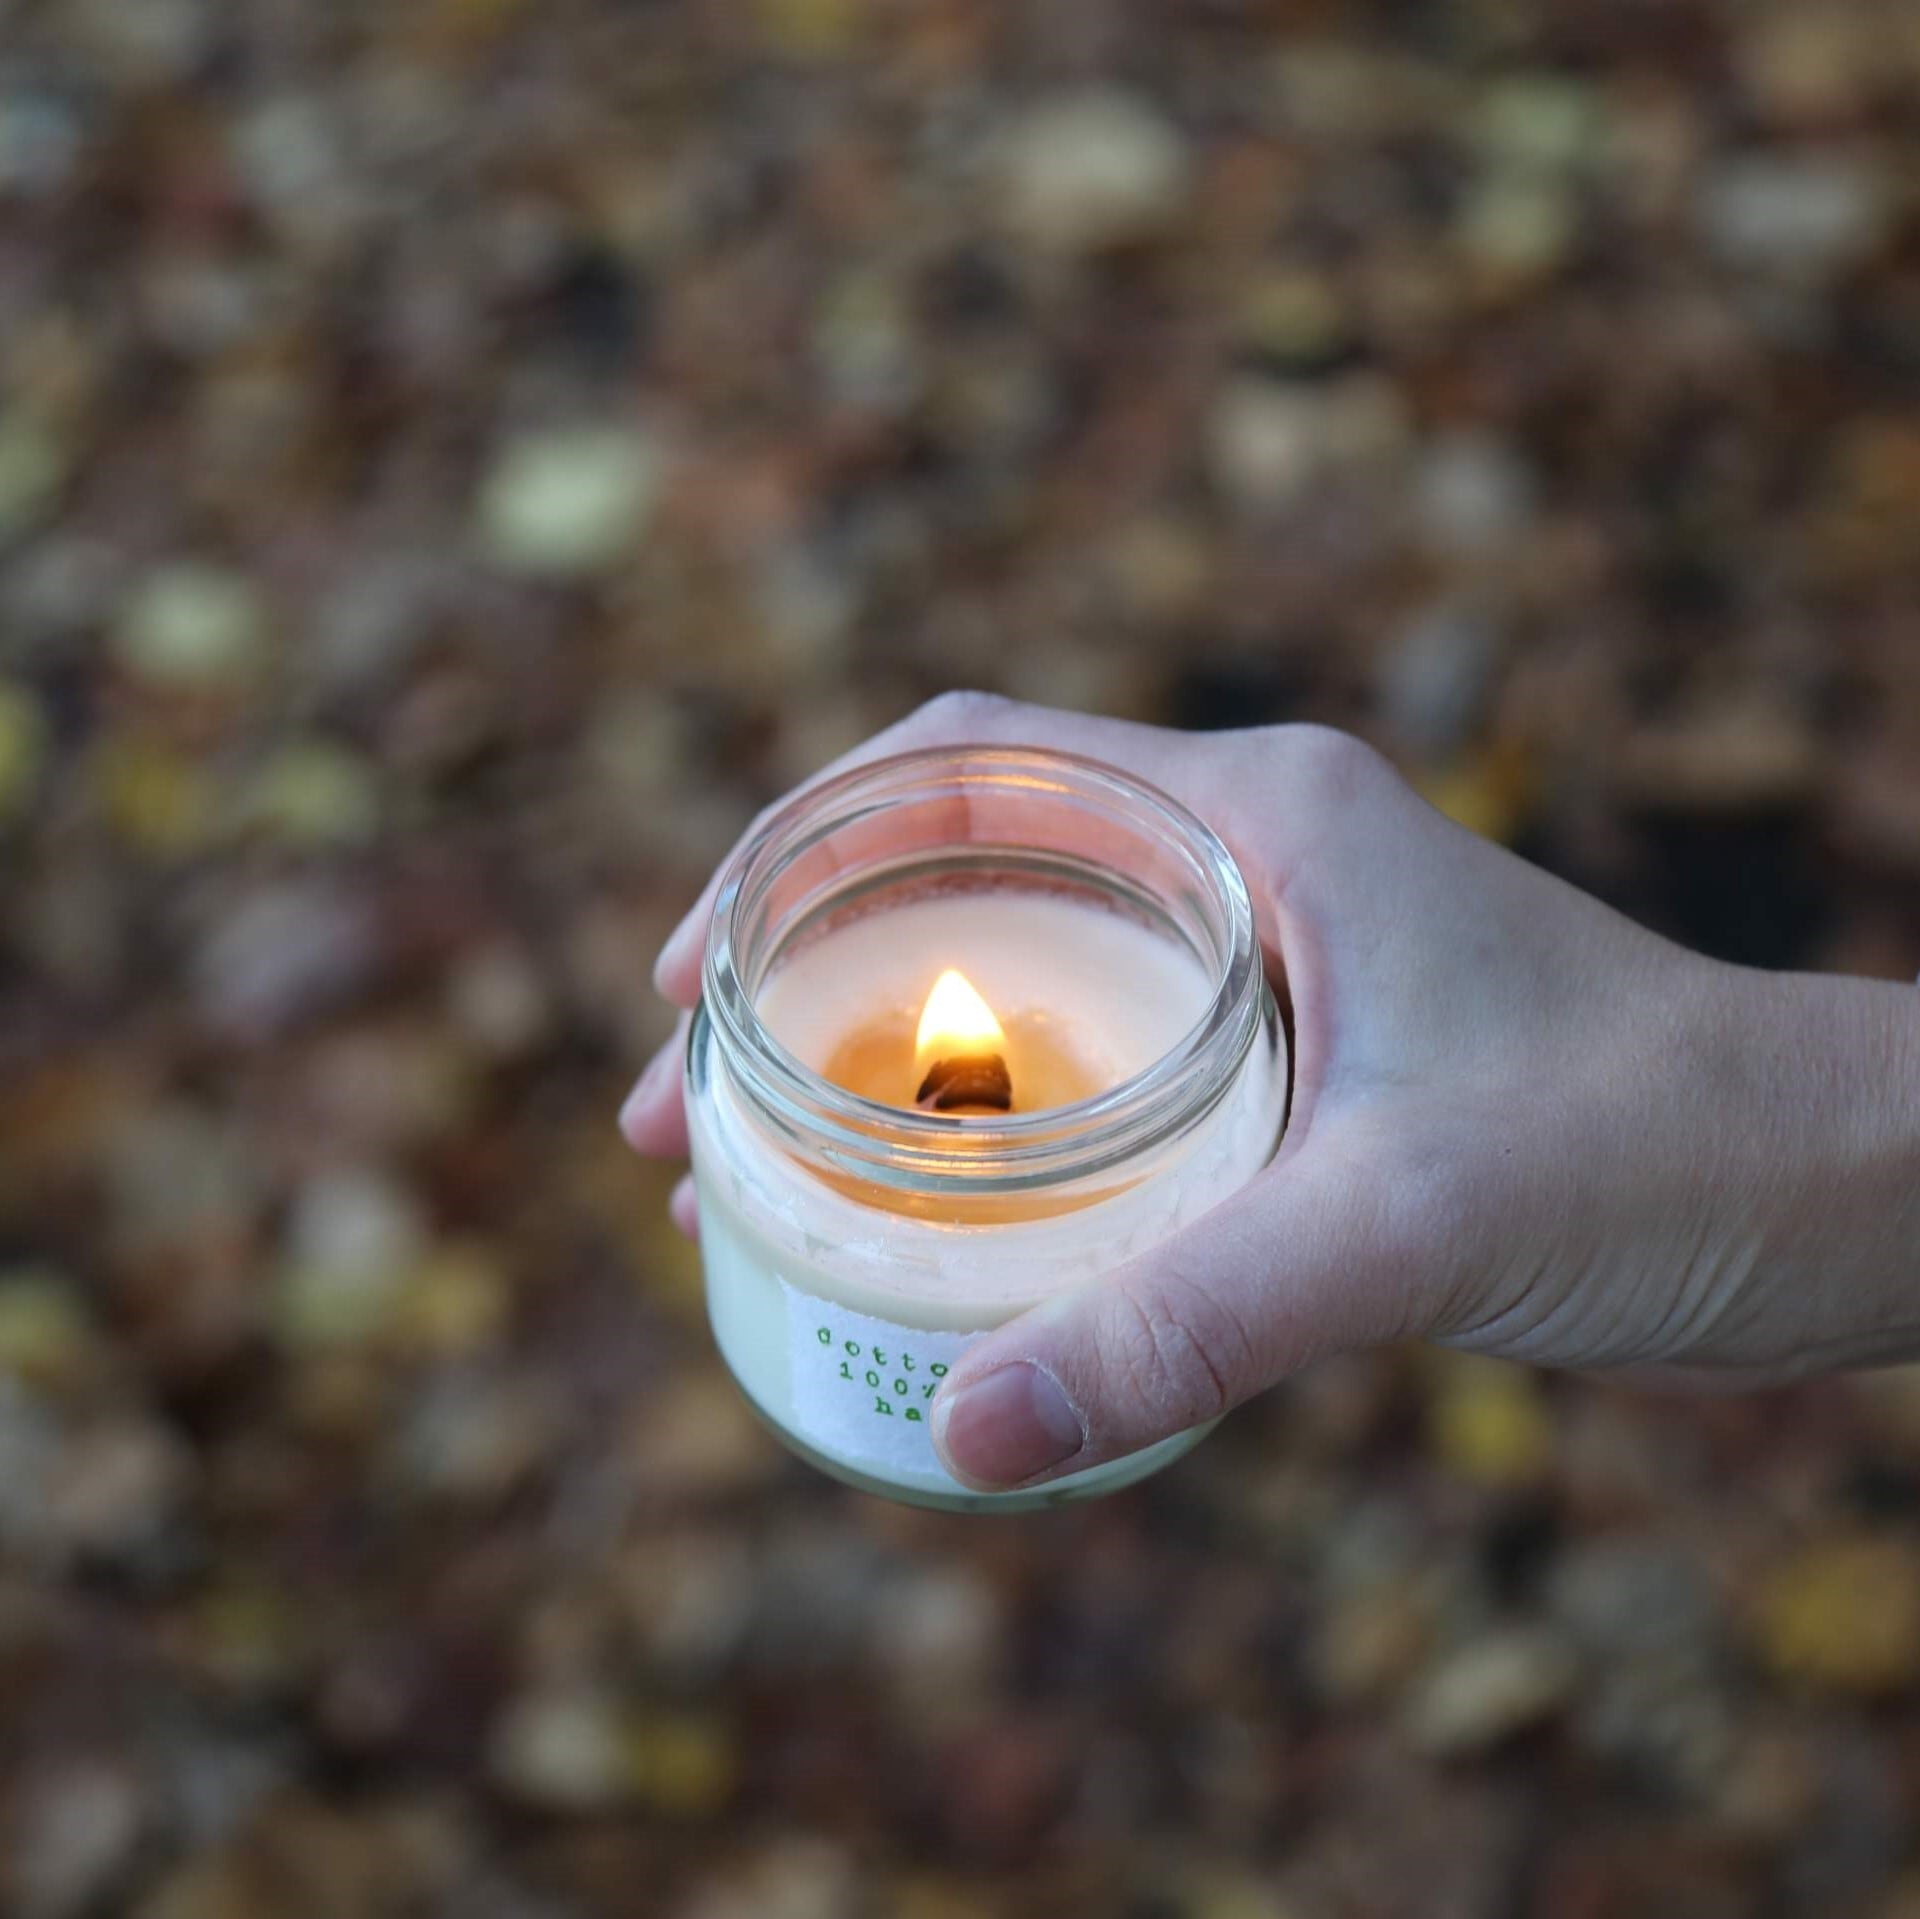 bzlemonビージーレモンの香り(M)soywax100%の天然木芯キャンドル【ソイワックスキャンドル ソイキャンドル アロマキャンドル】